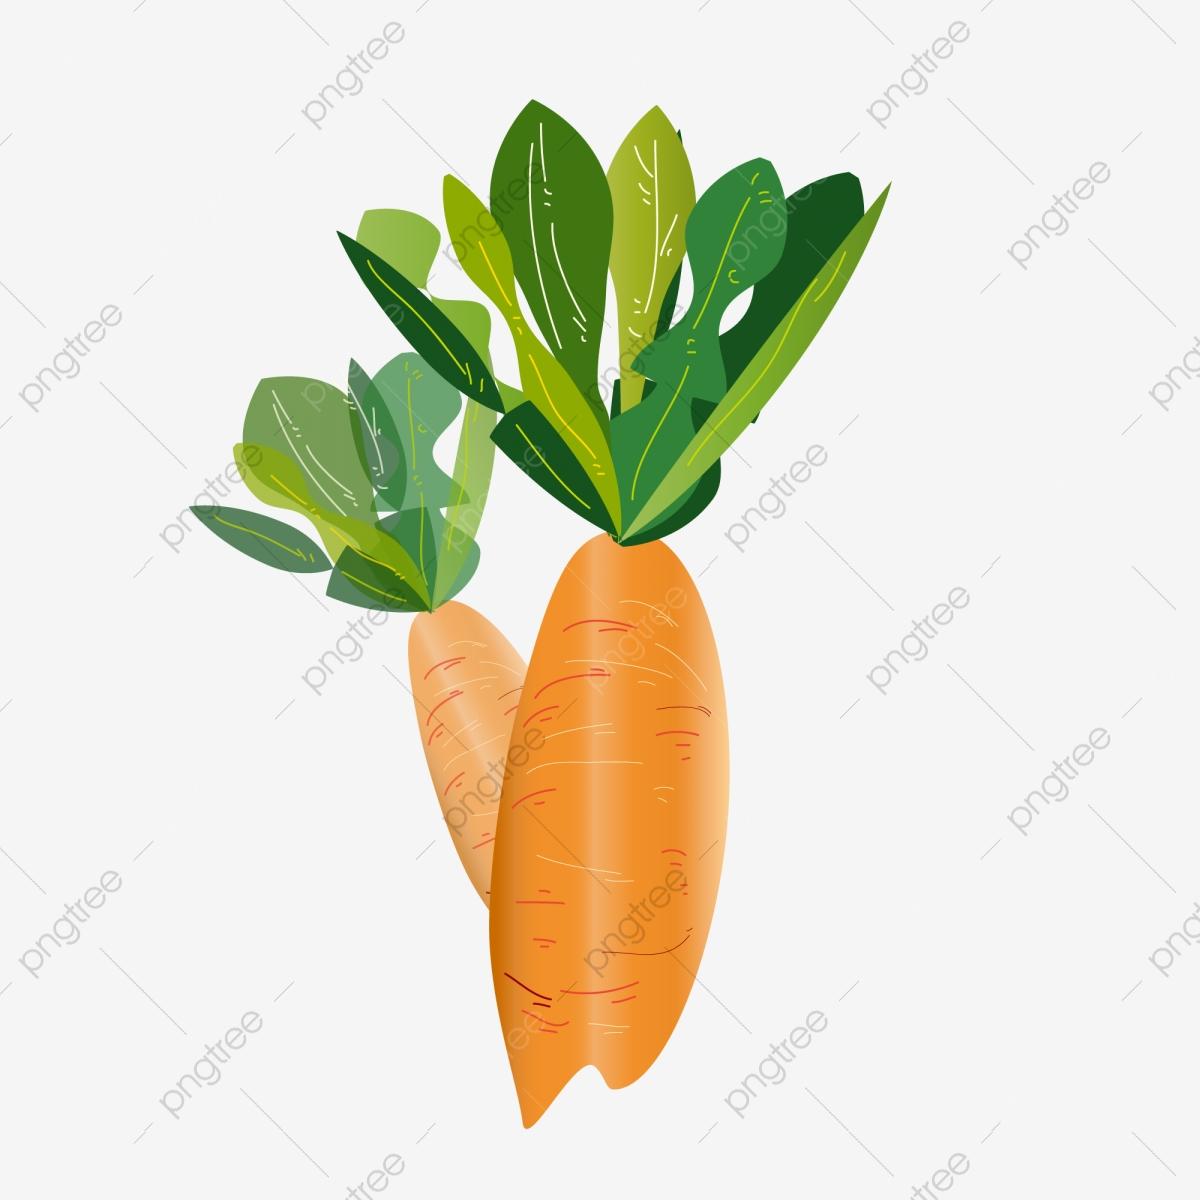 clip library library Orange illustration vegetables food. Vector carrot green vegetable